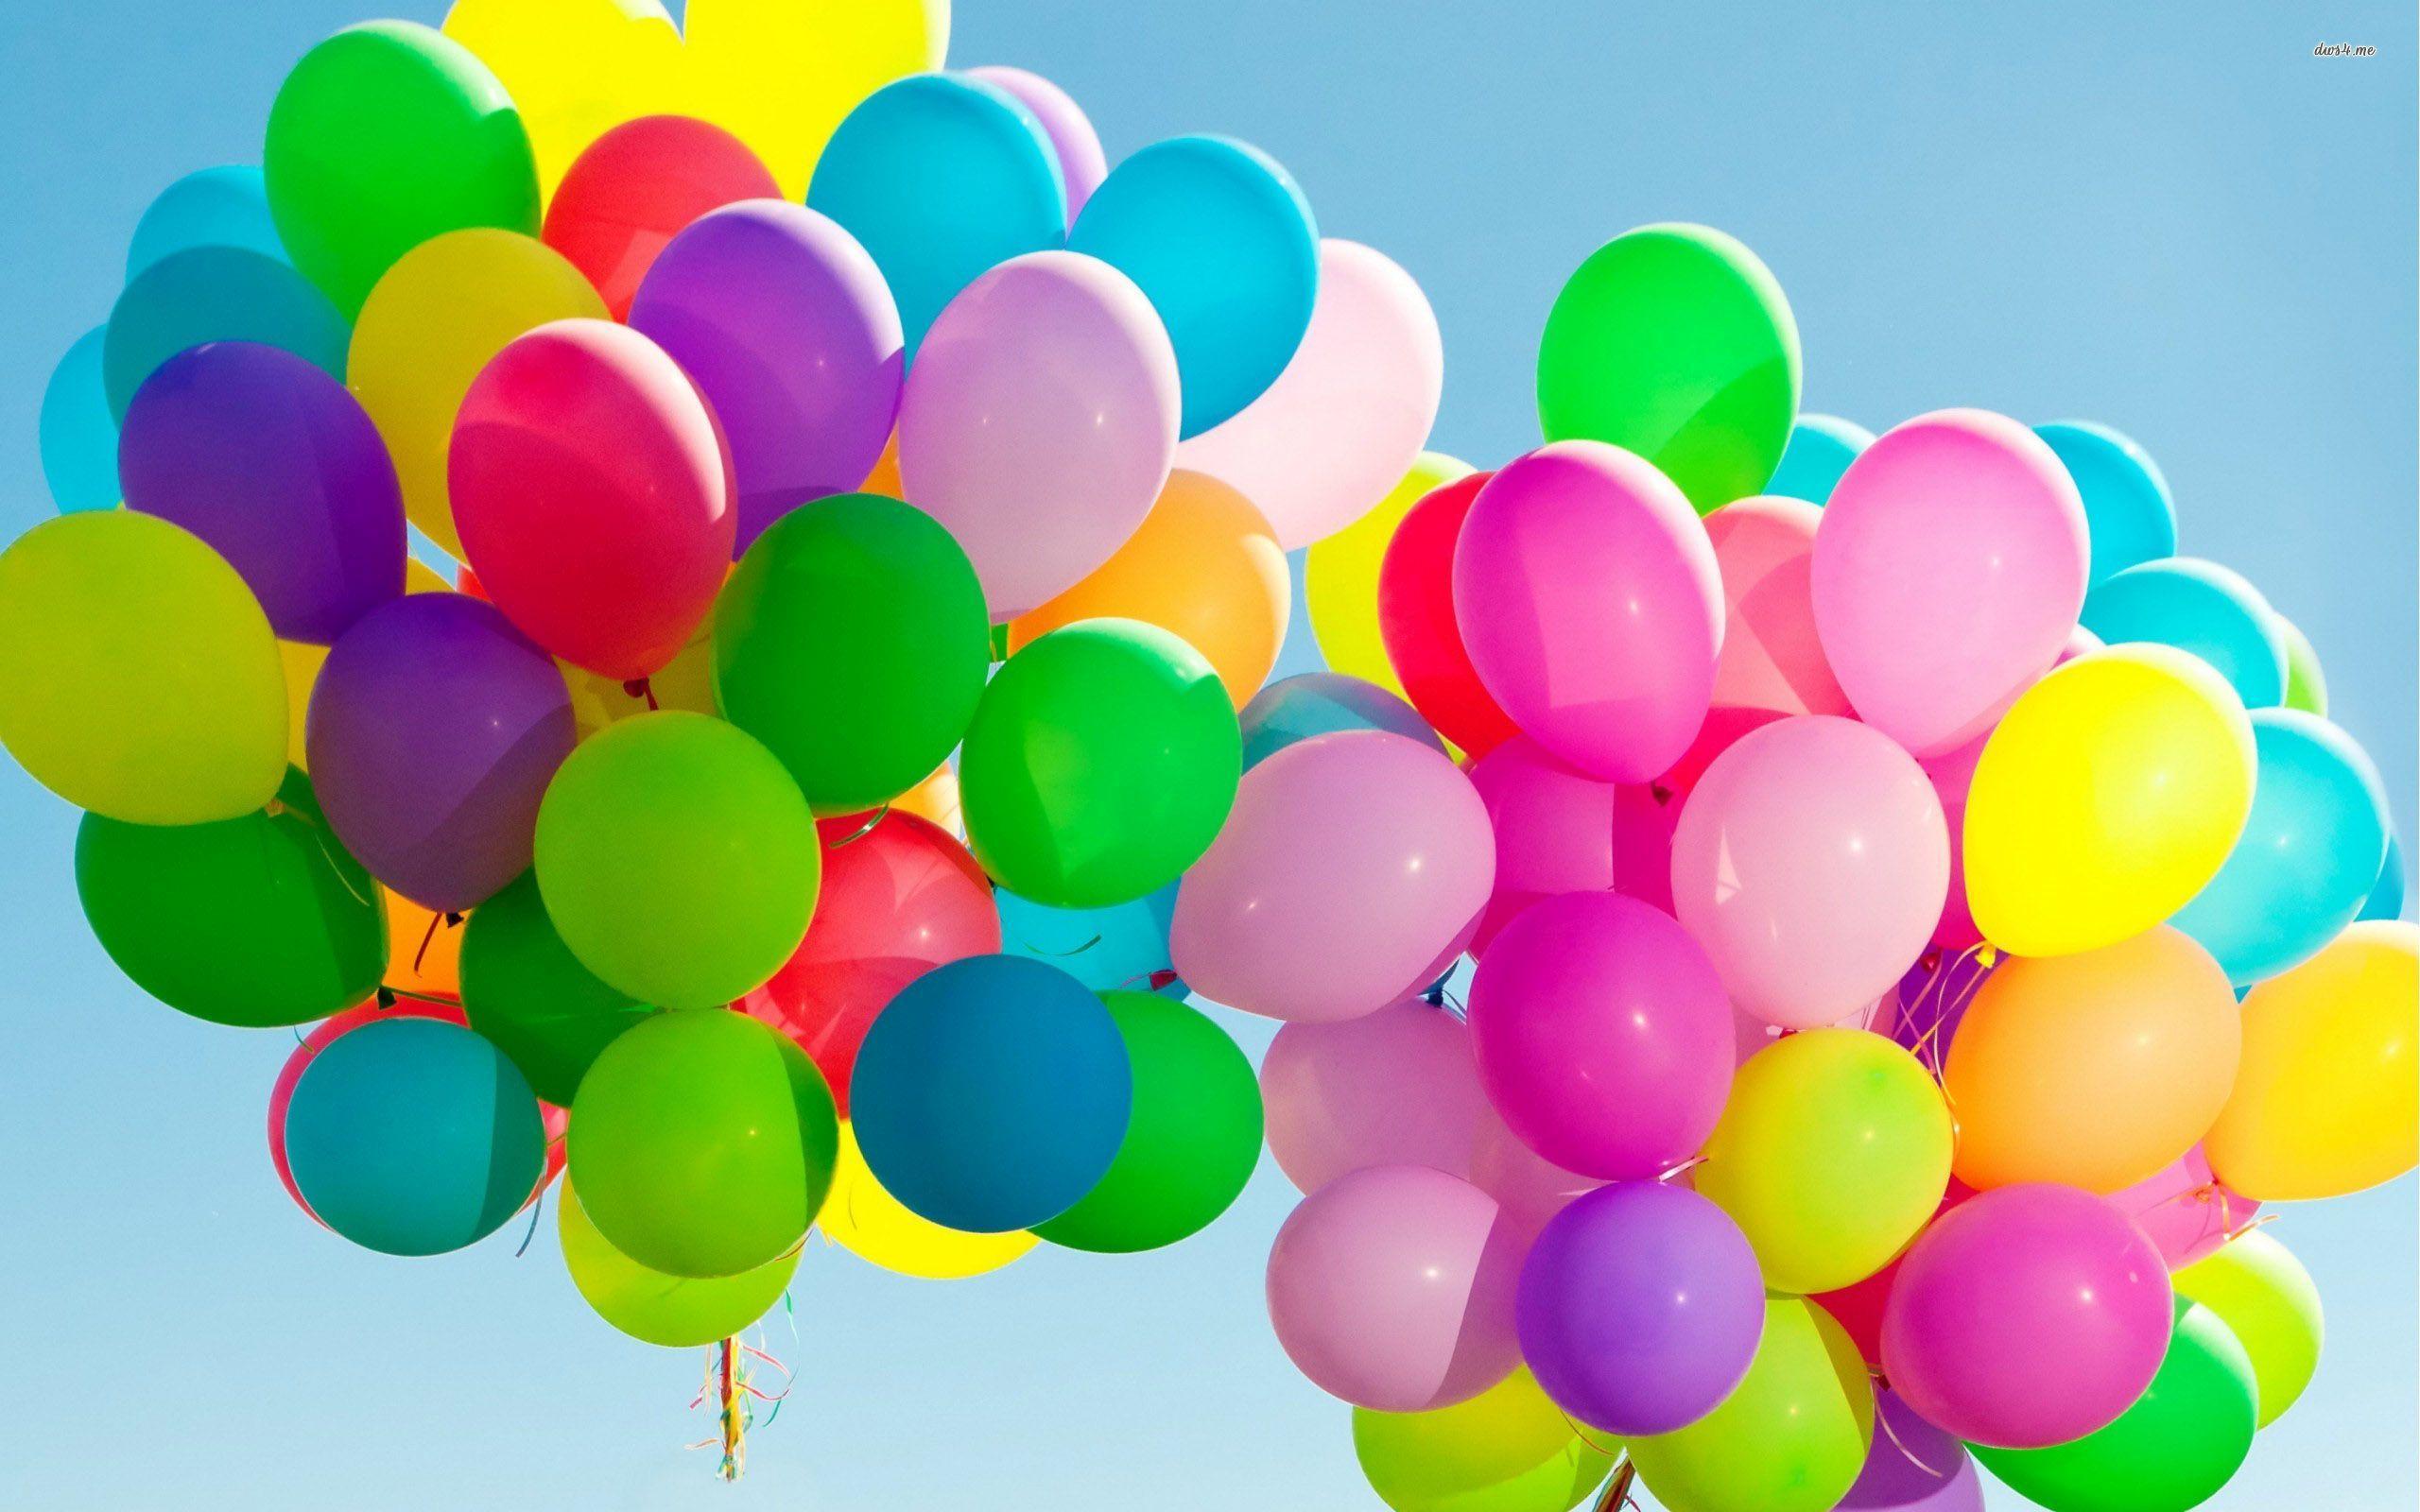 Balloons Wallpaper Collection 43 2560x1600